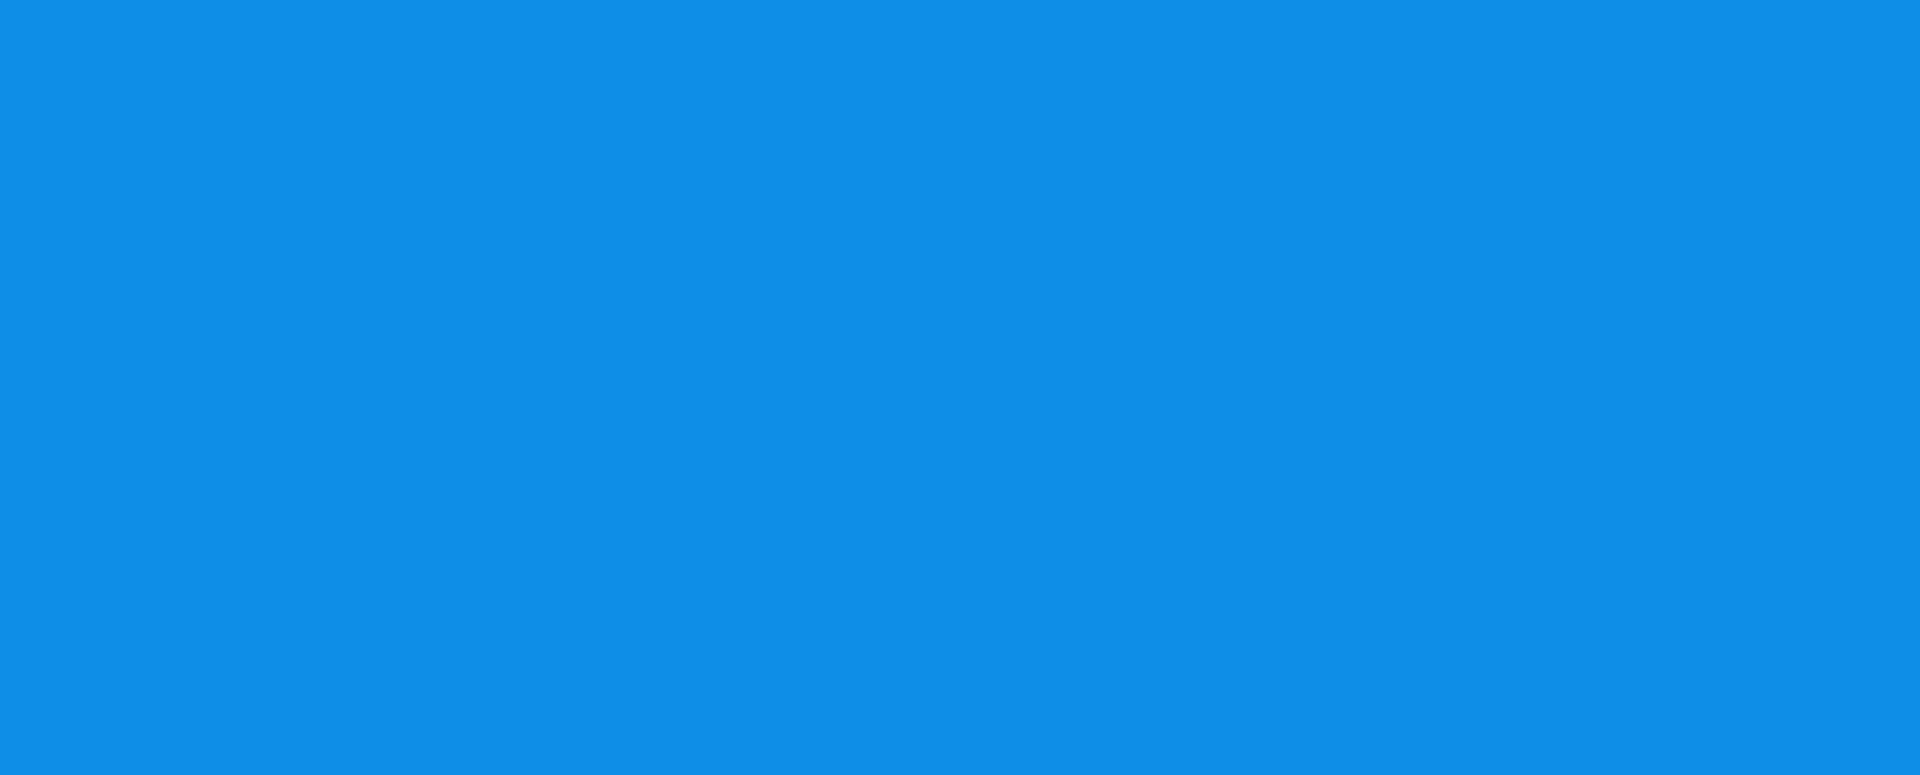 screenshot background shape